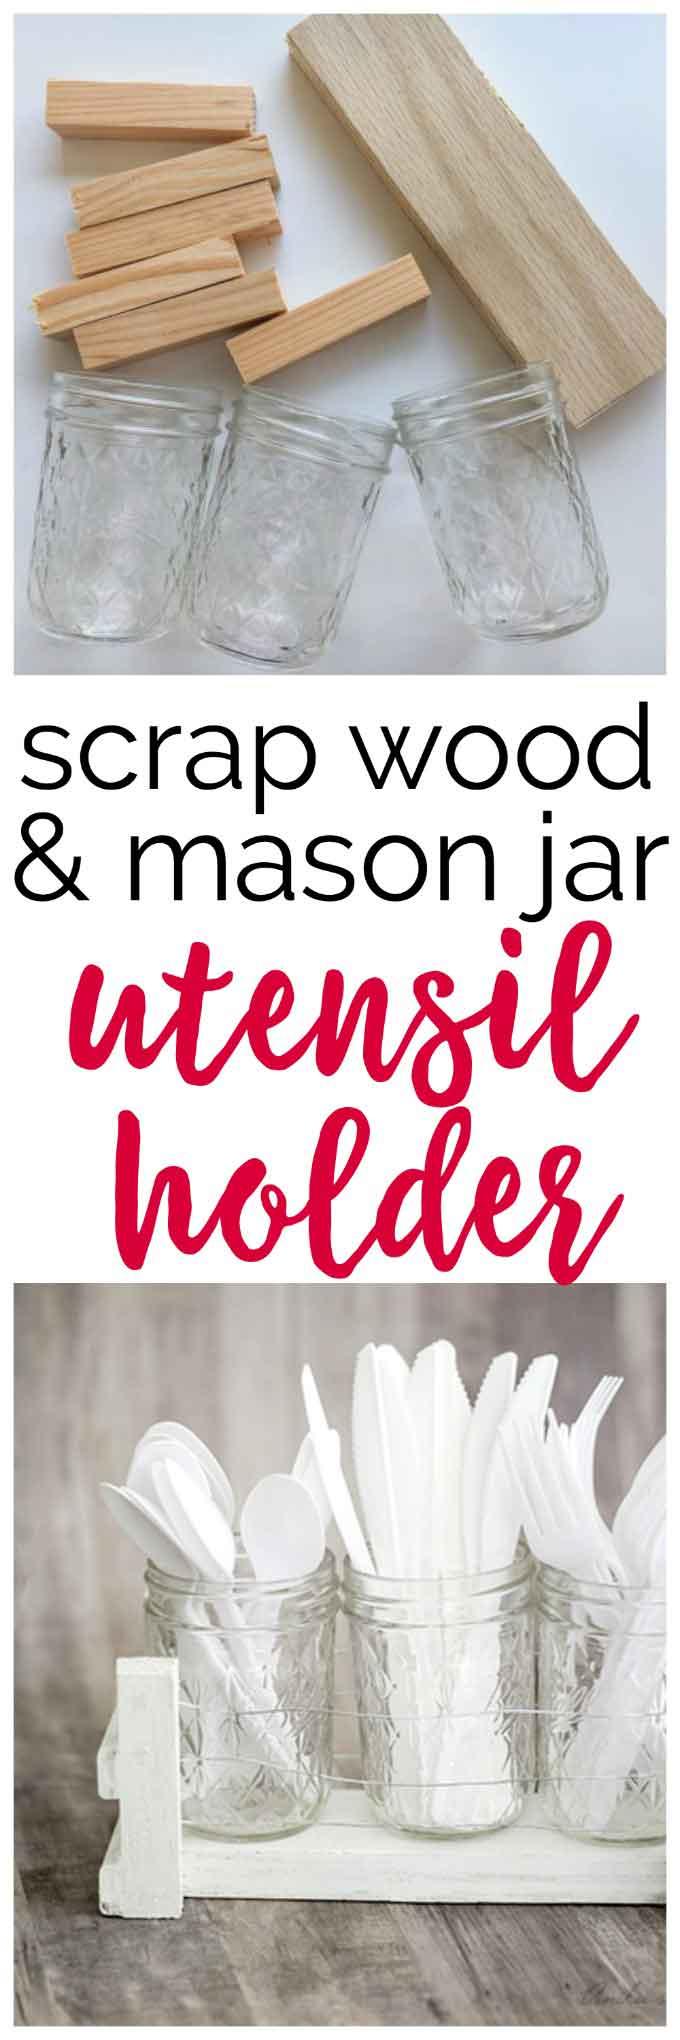 Easy Mason Jar utensil organizer made using scrap wood and mason jars!